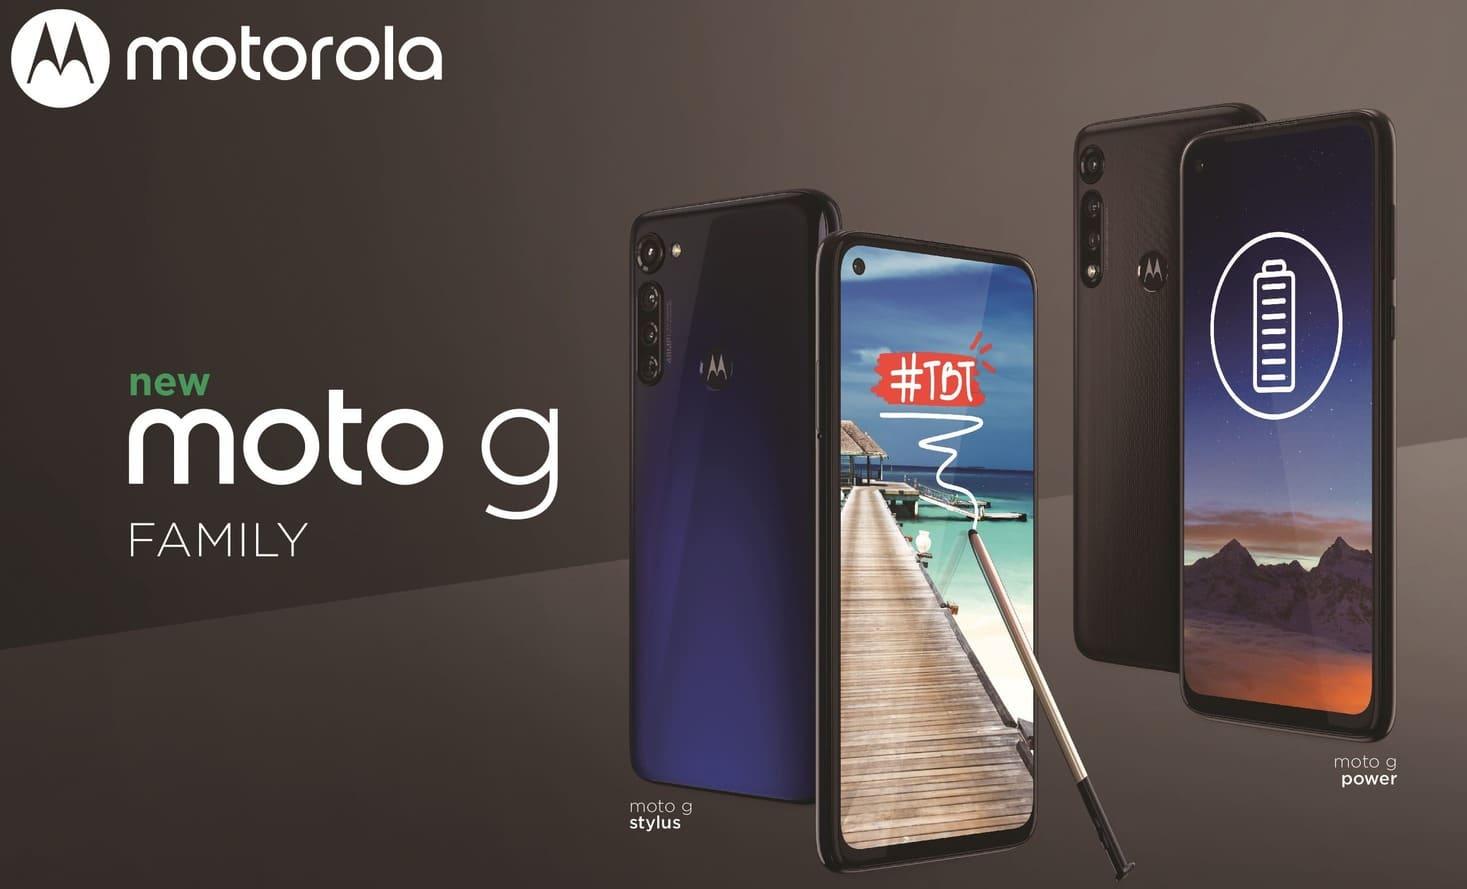 Moto G Stylus и Moto G Power: характеристики смартфонов с Max Vision